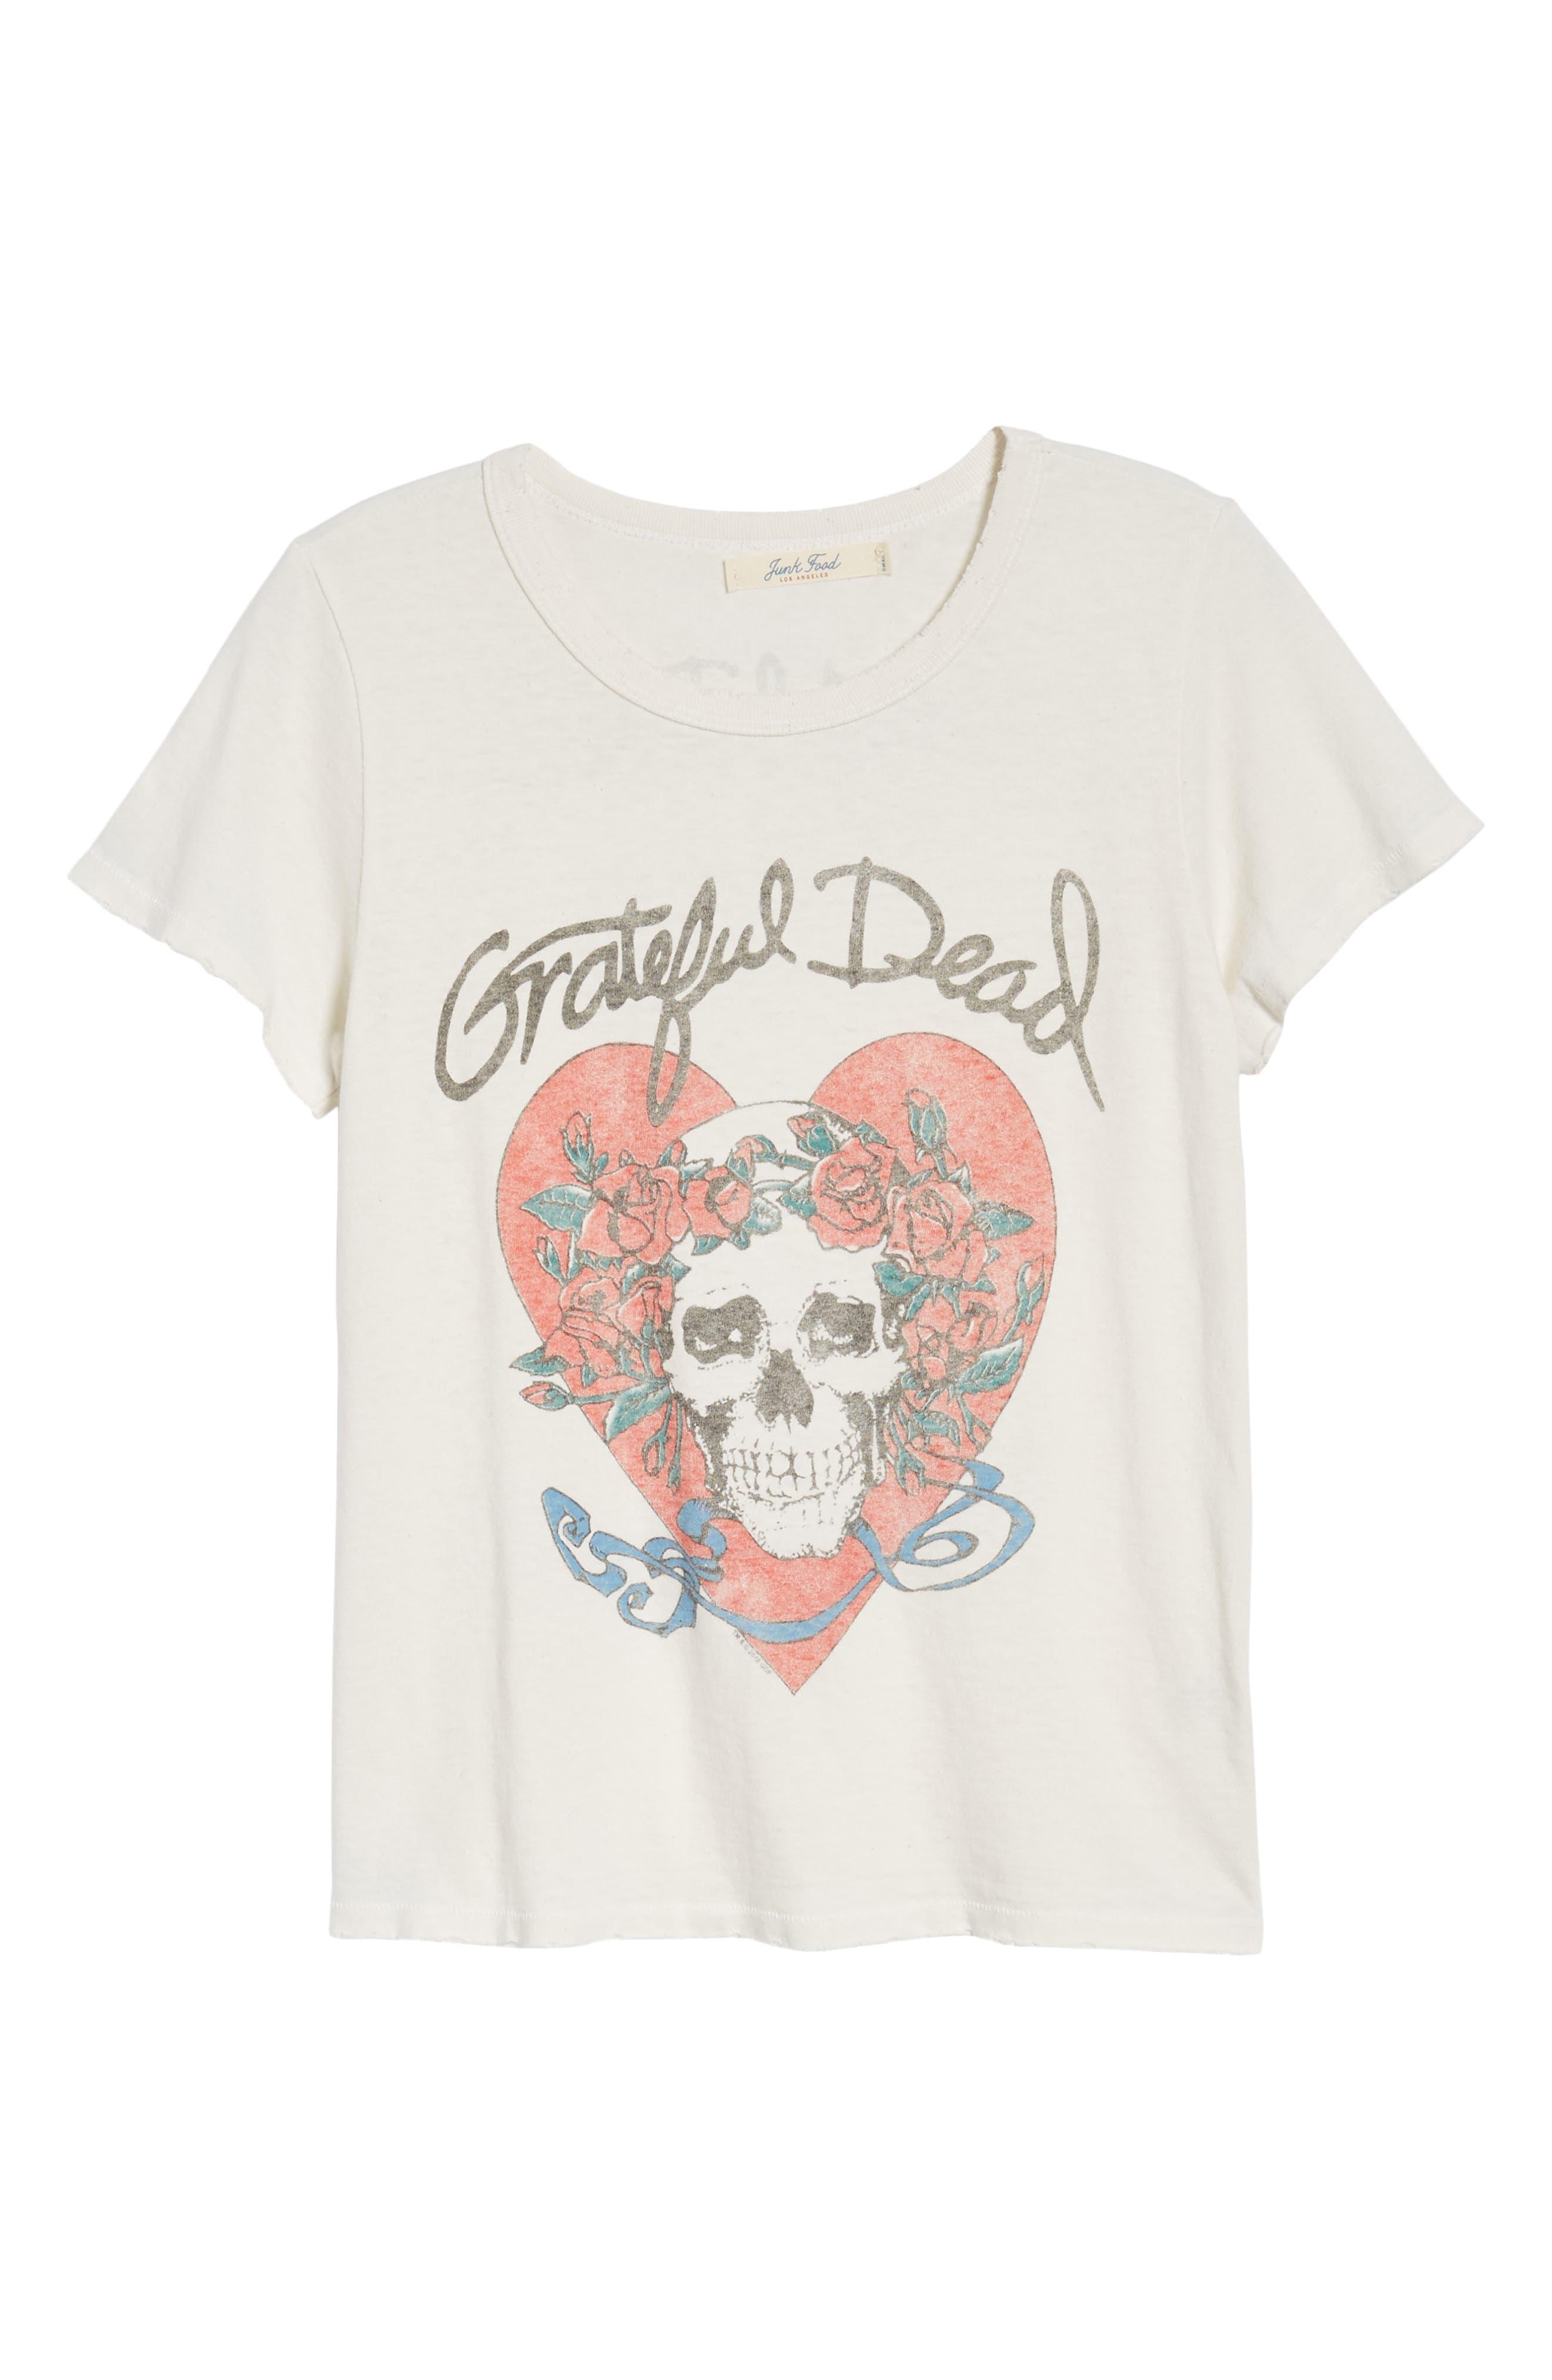 Grateful Dead Tee,                             Alternate thumbnail 6, color,                             Vintage White